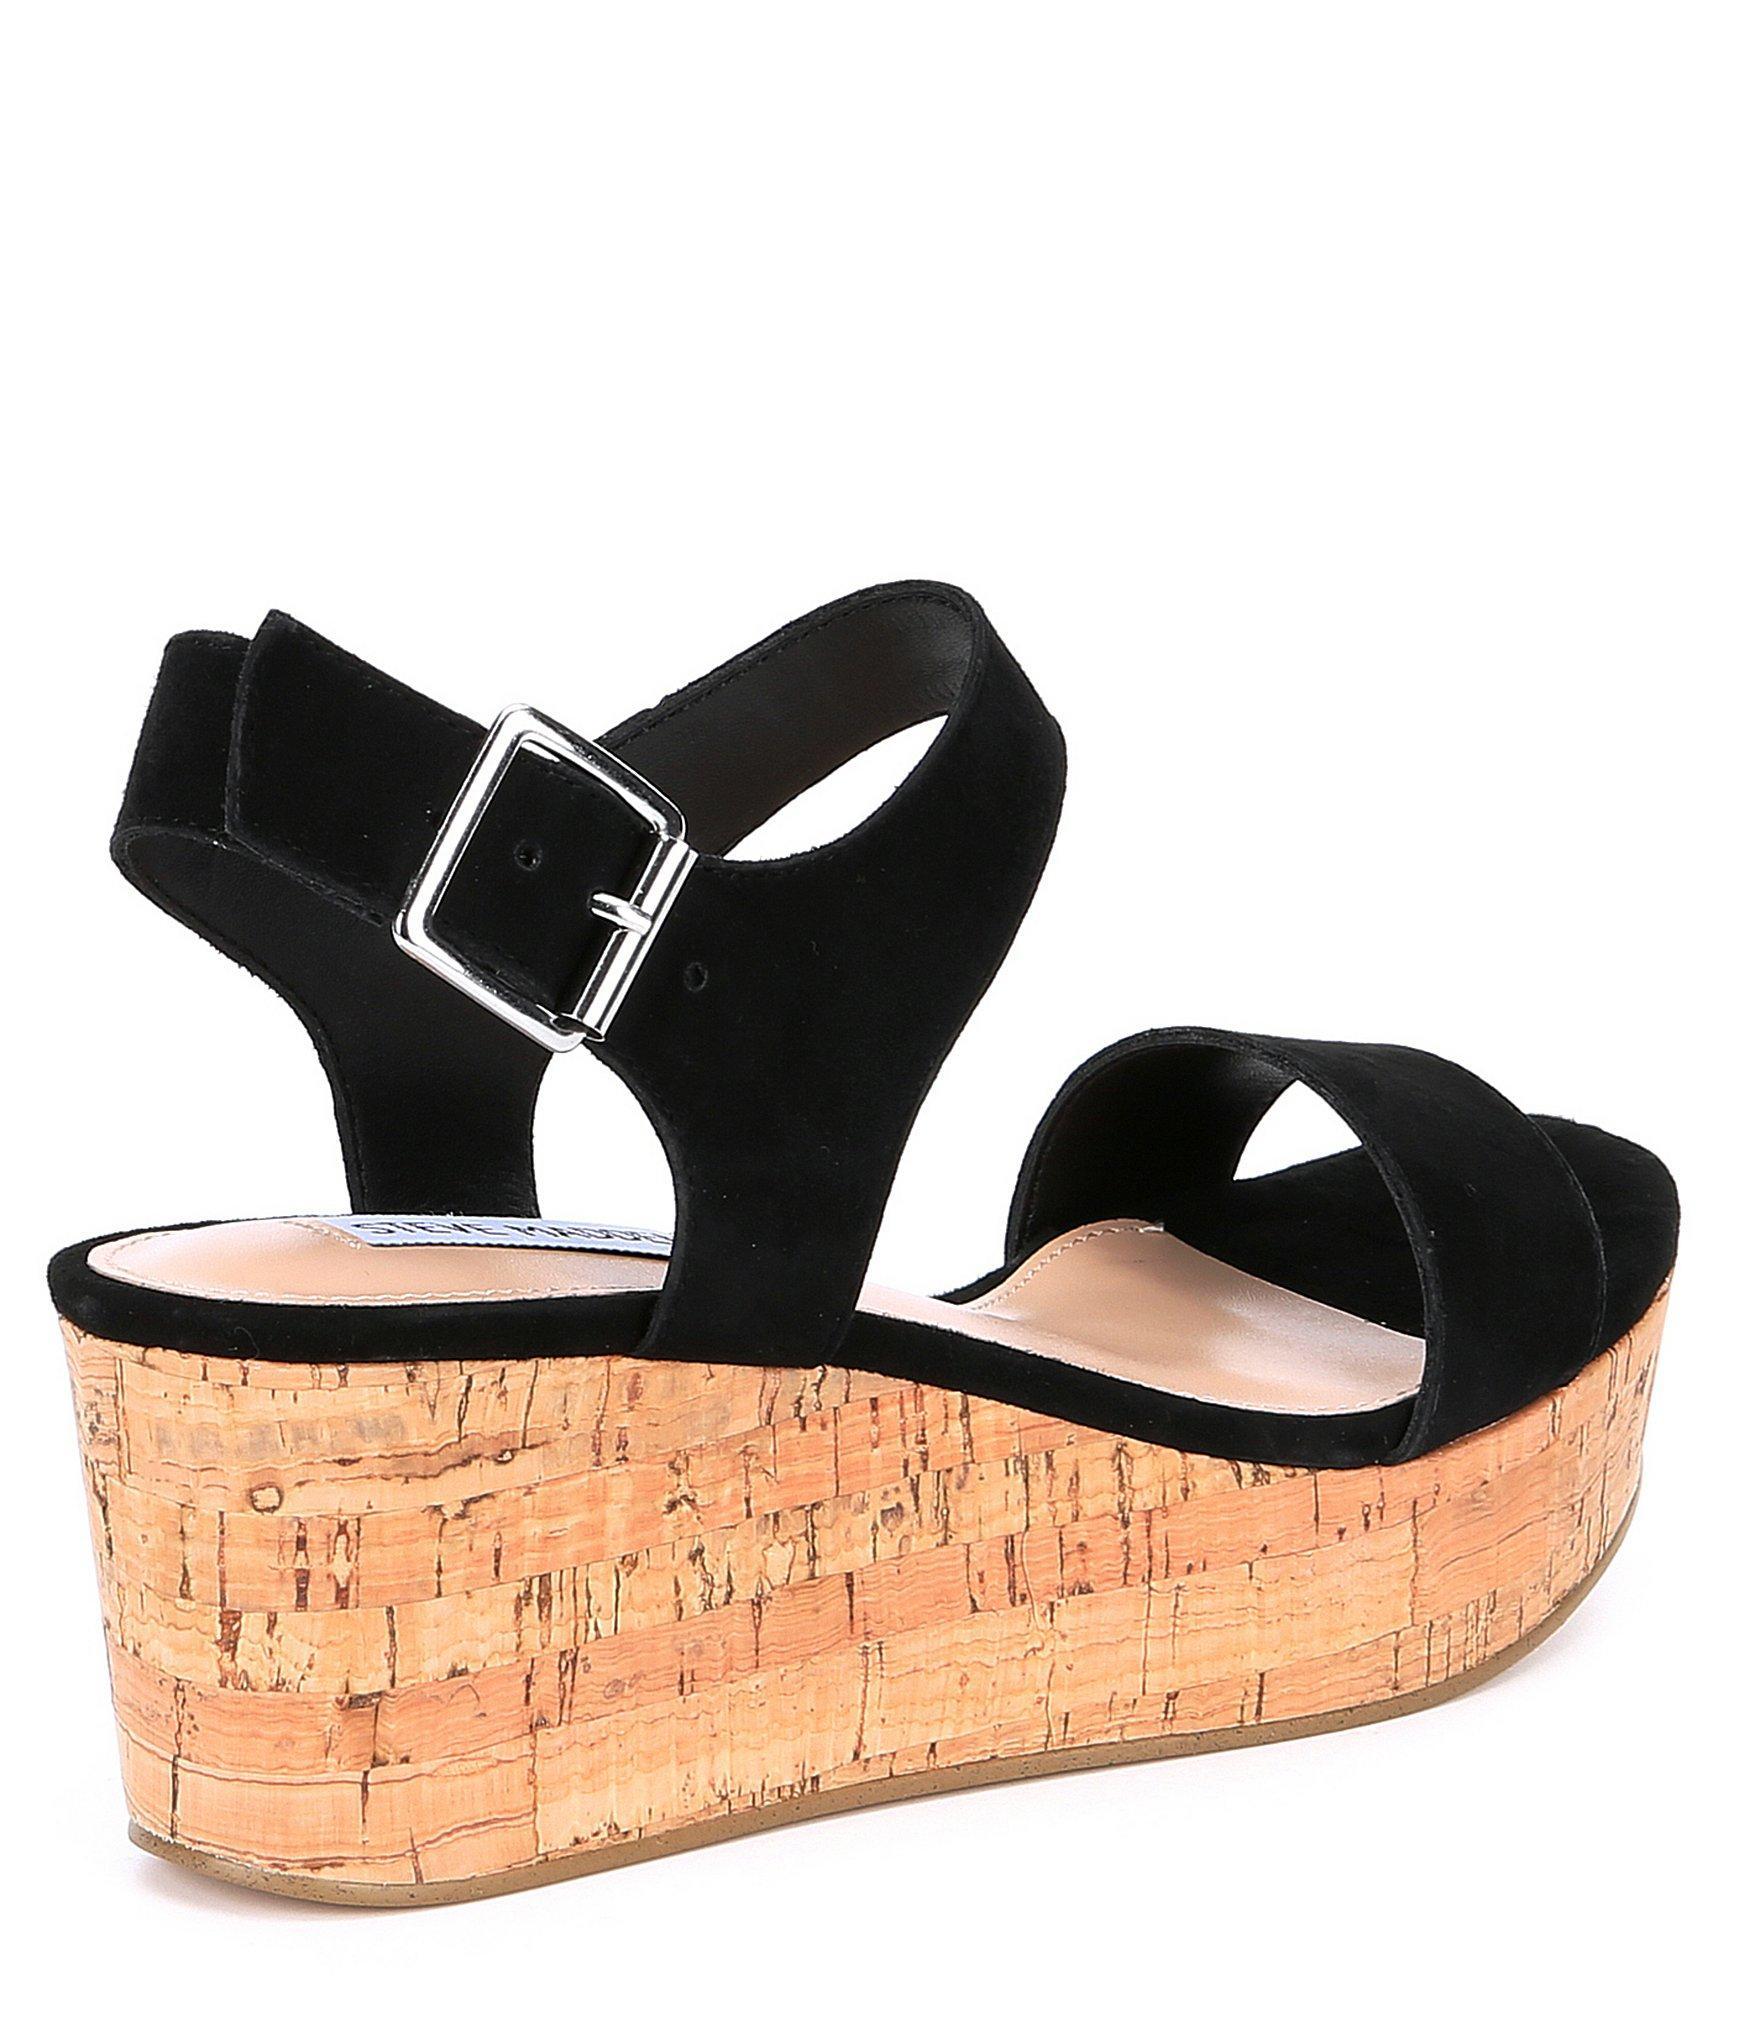 64221b188e4 ... Black Breathe Suede Platform Sandals - Lyst. View fullscreen